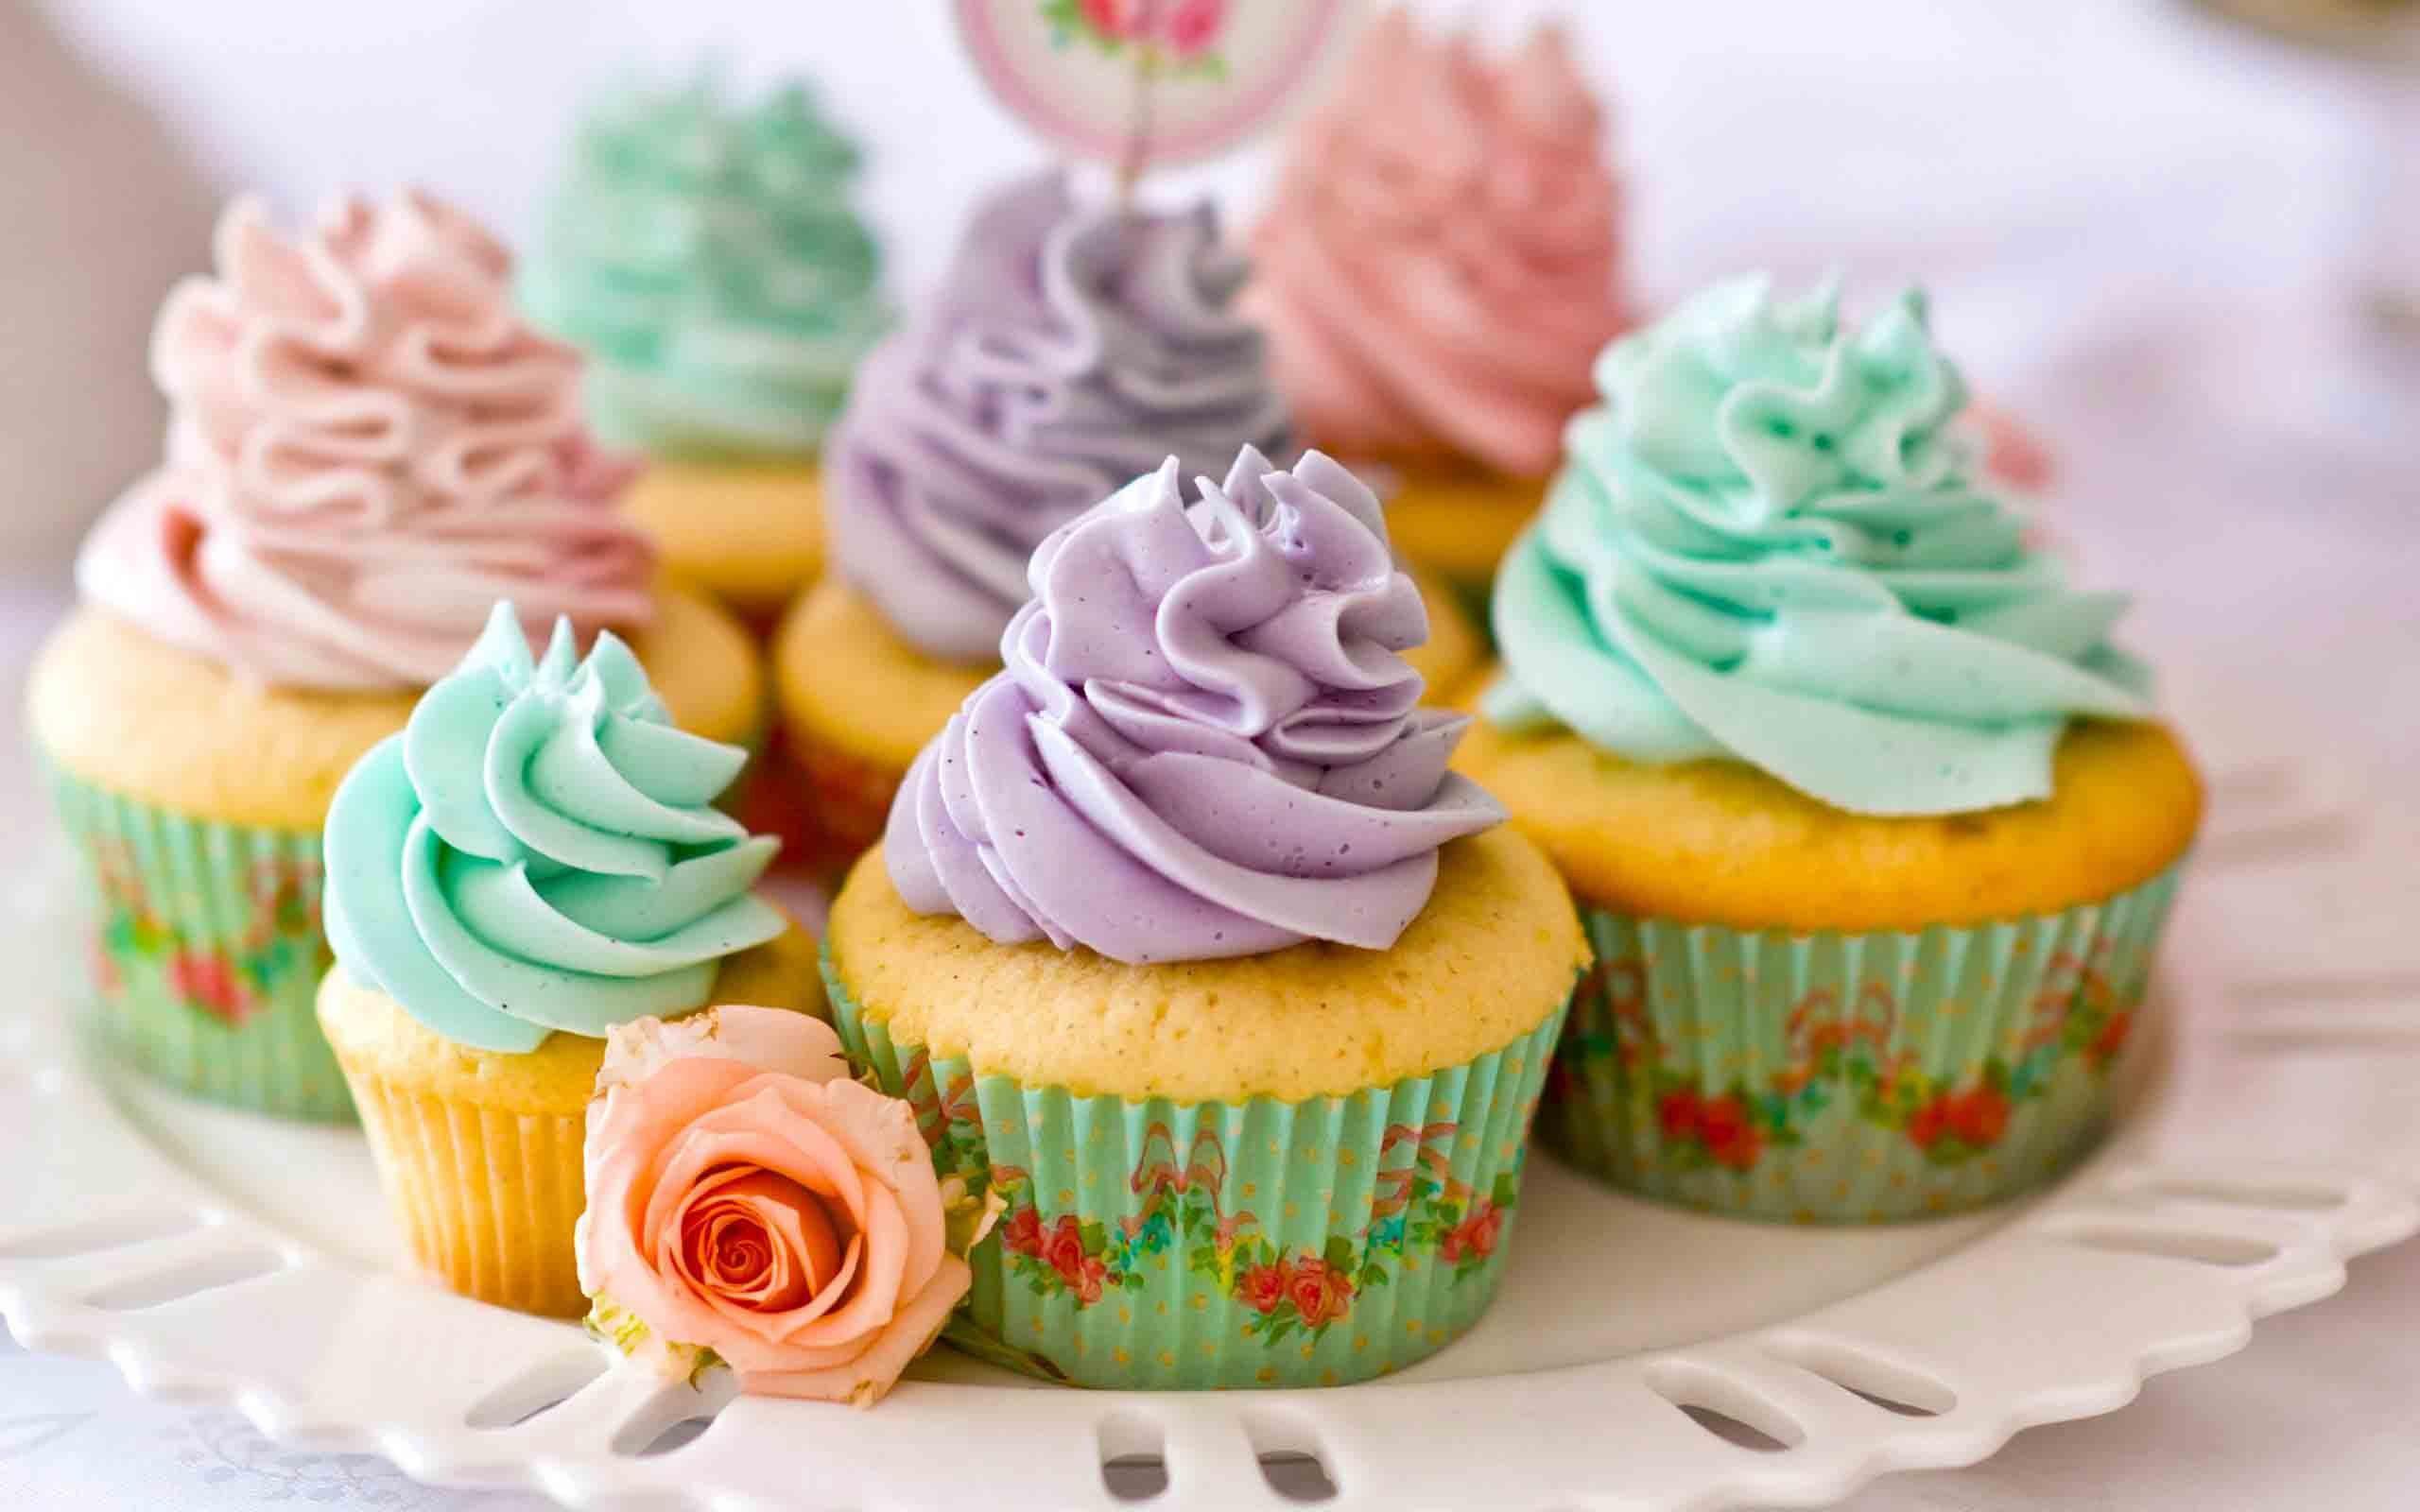 Cake Icing Video Free Download